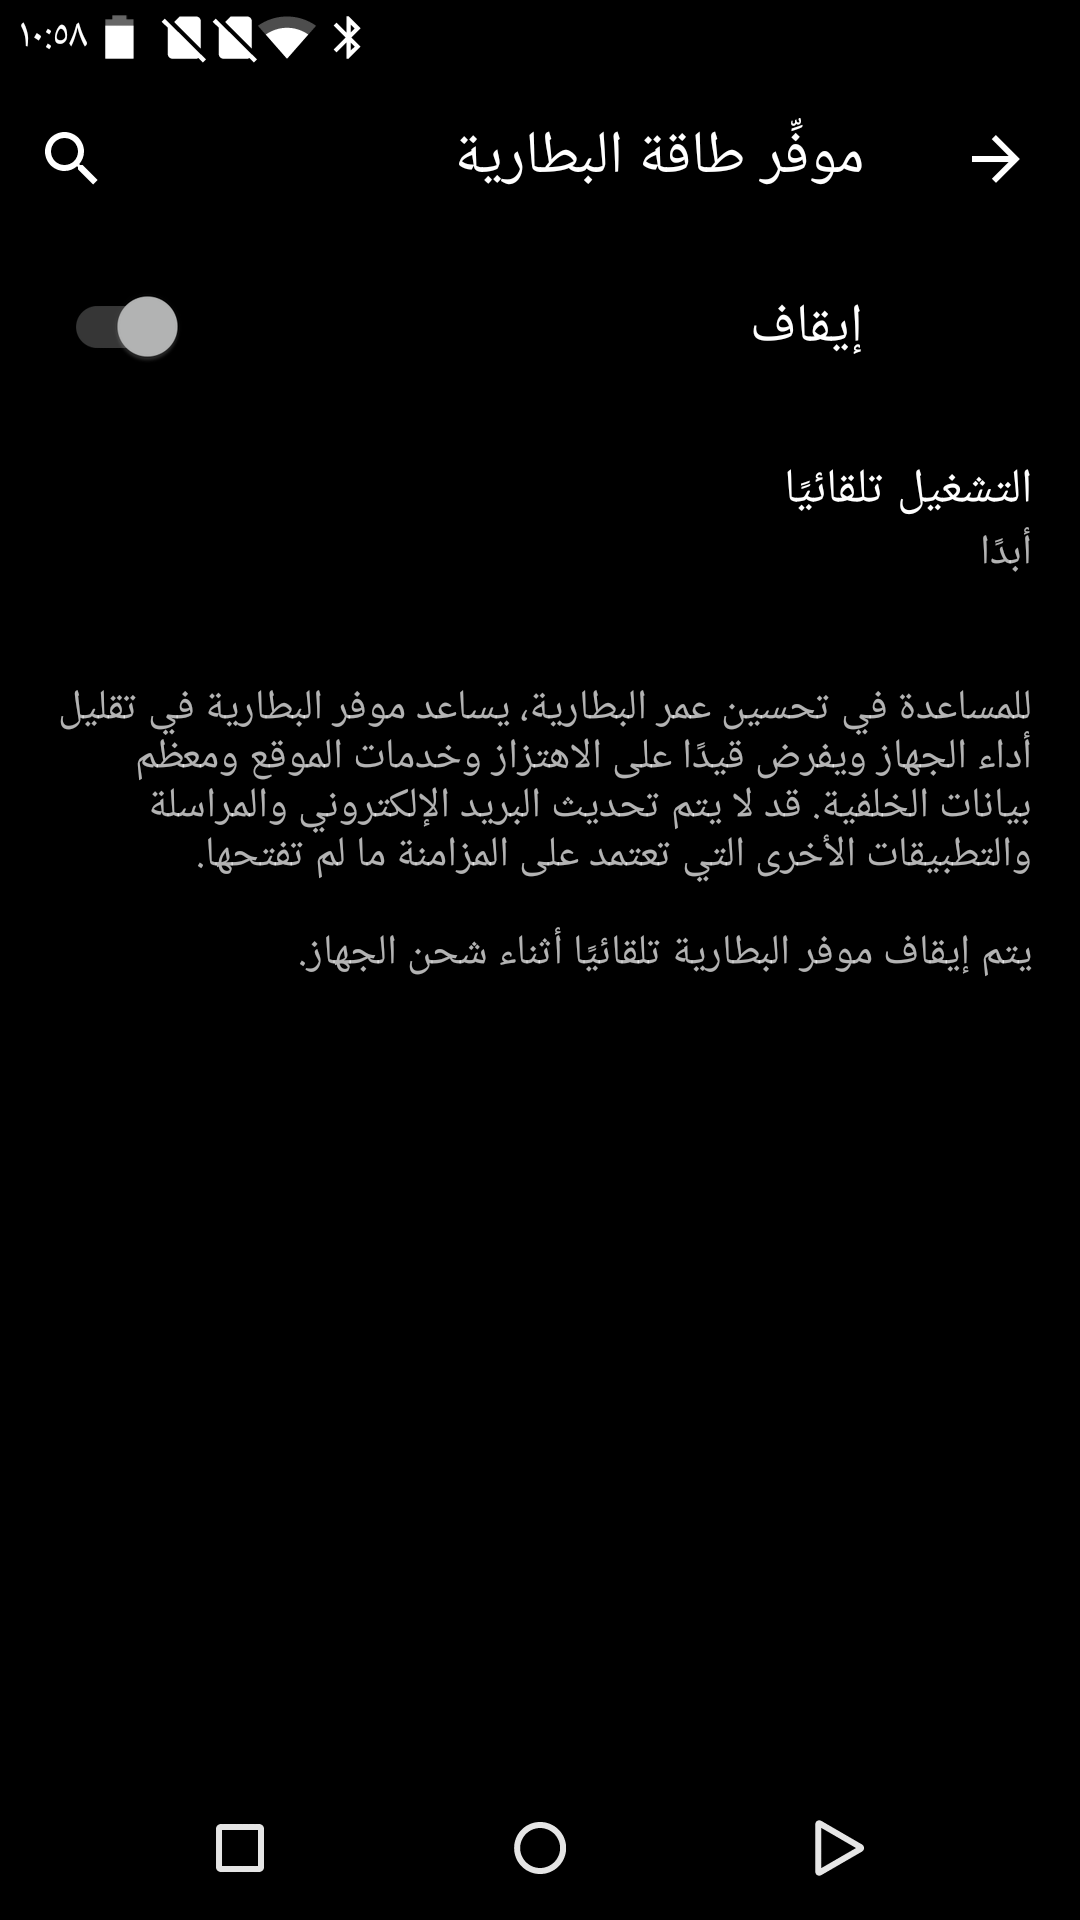 Screenshot_٢٠١٥-١١-٢٠-٢٢-٥٨-٤٥